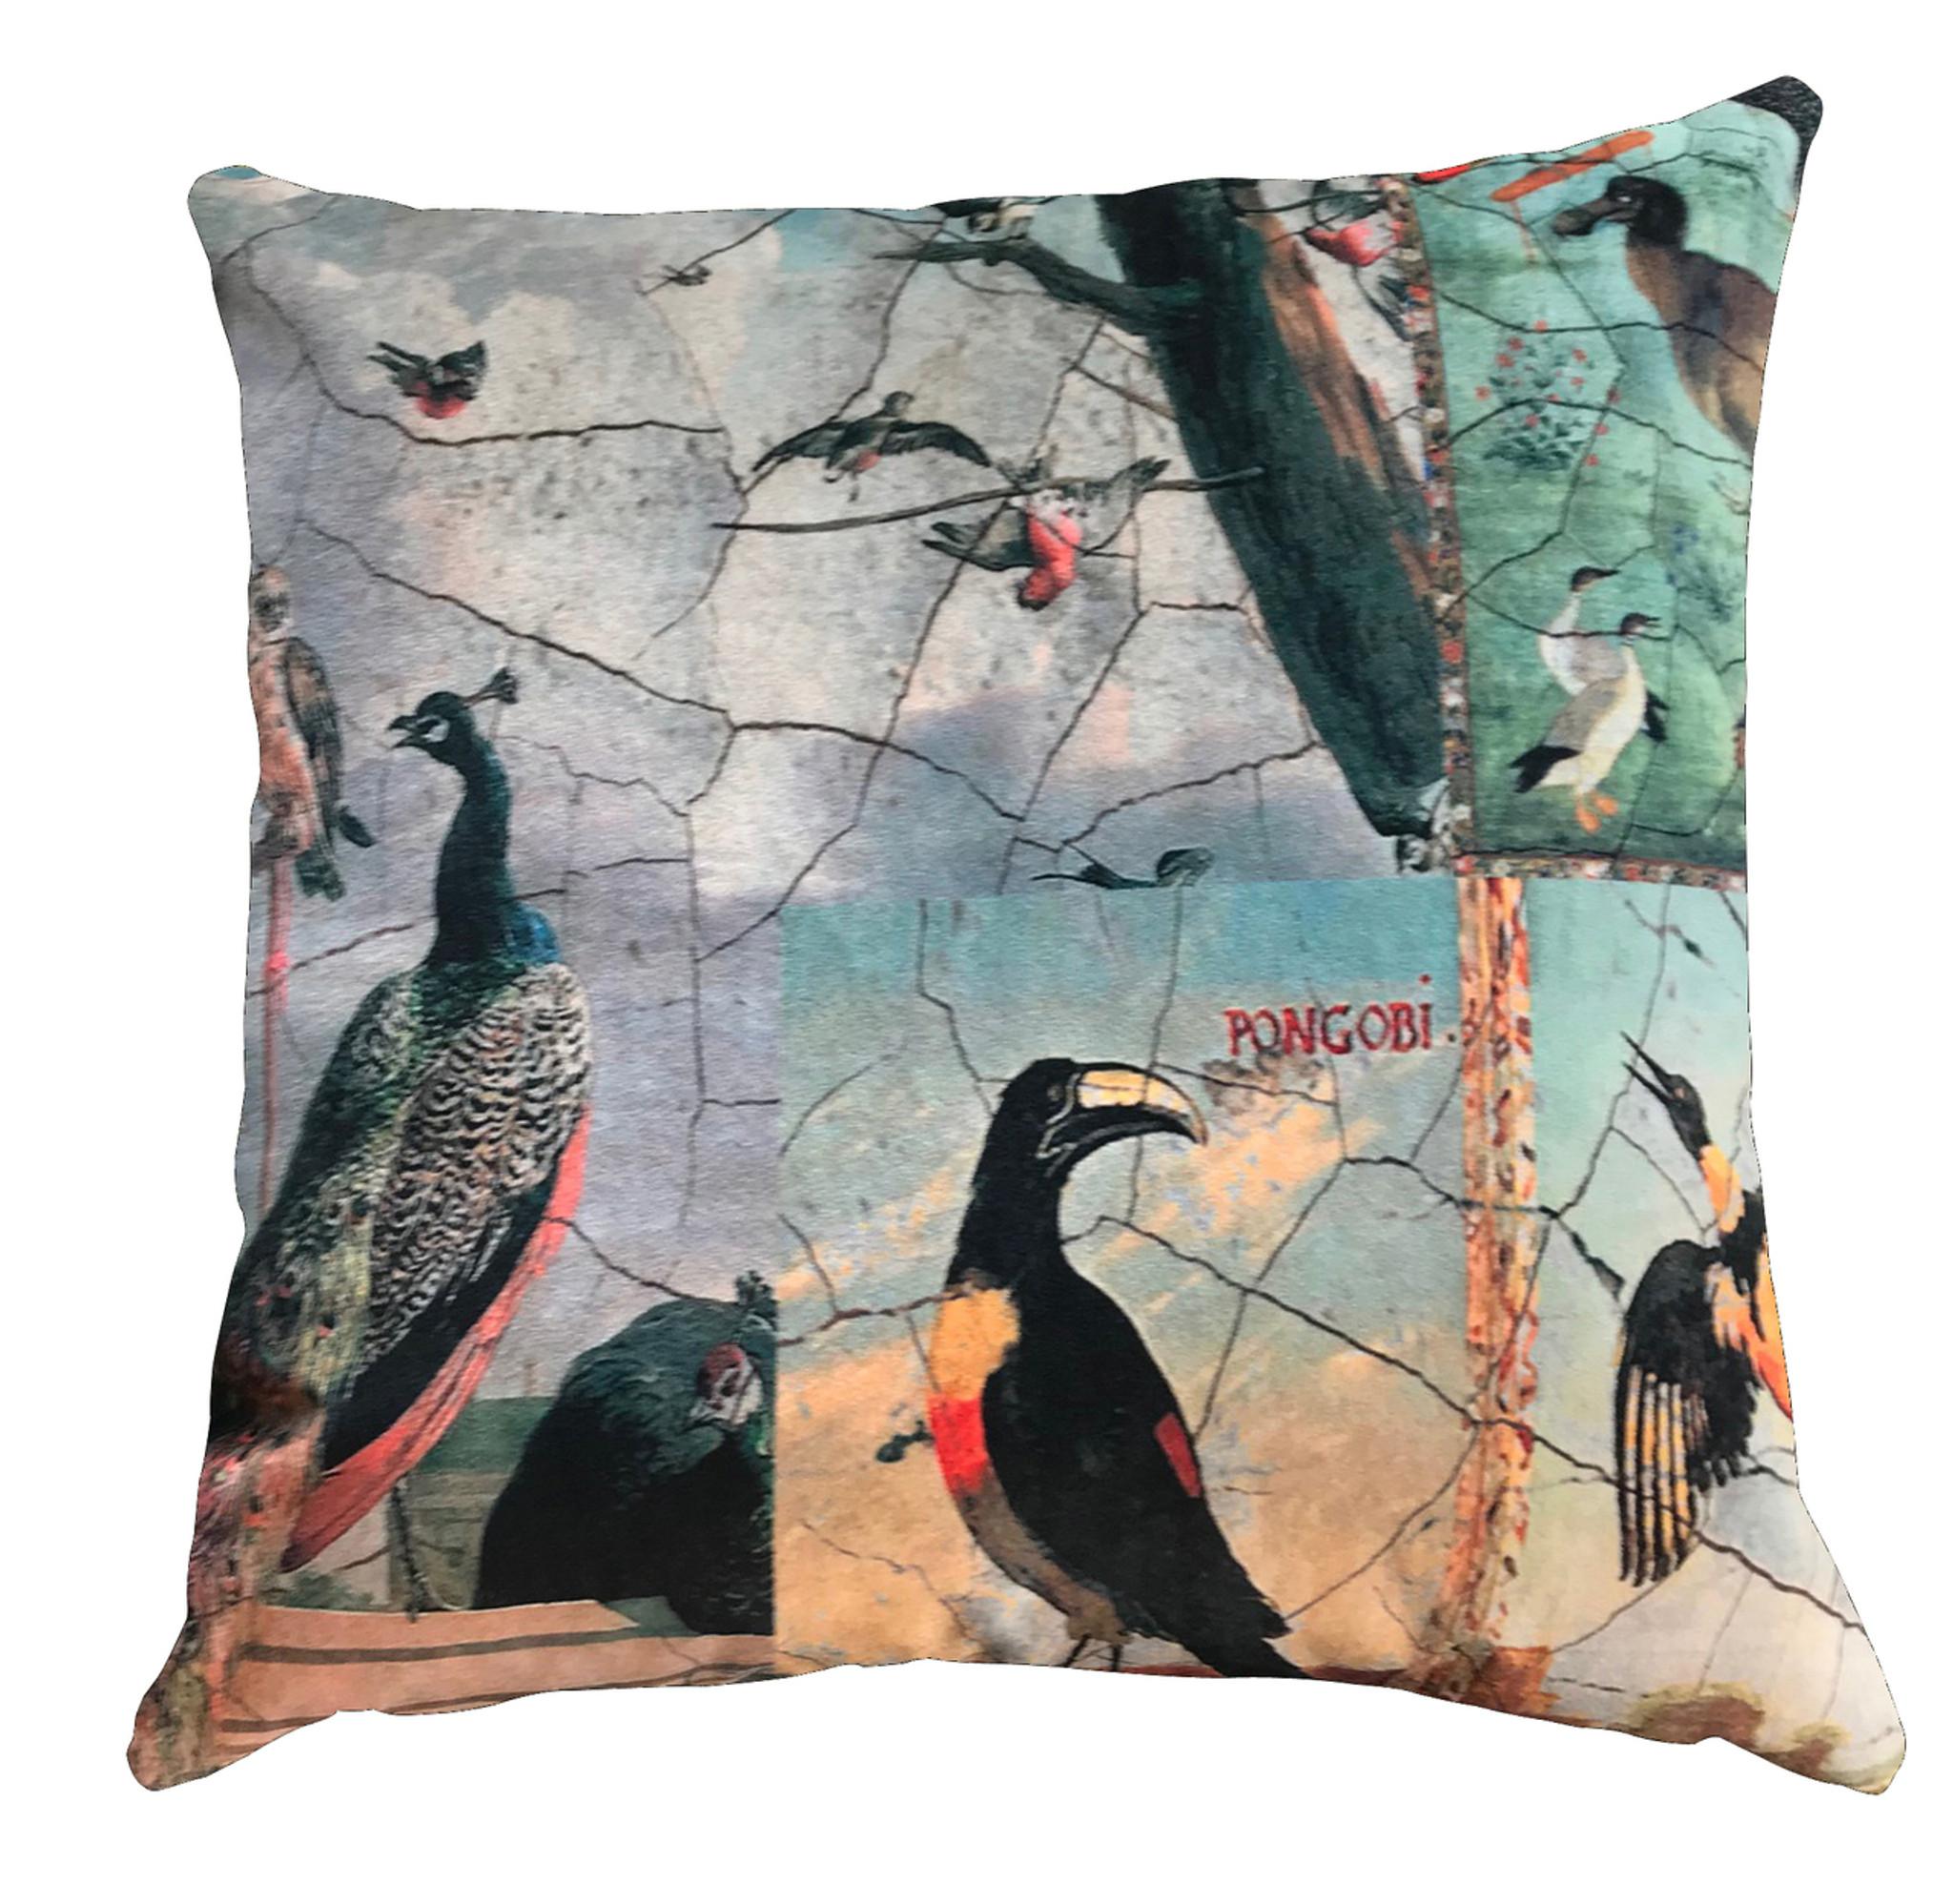 Cushion - The Birds with Peacock